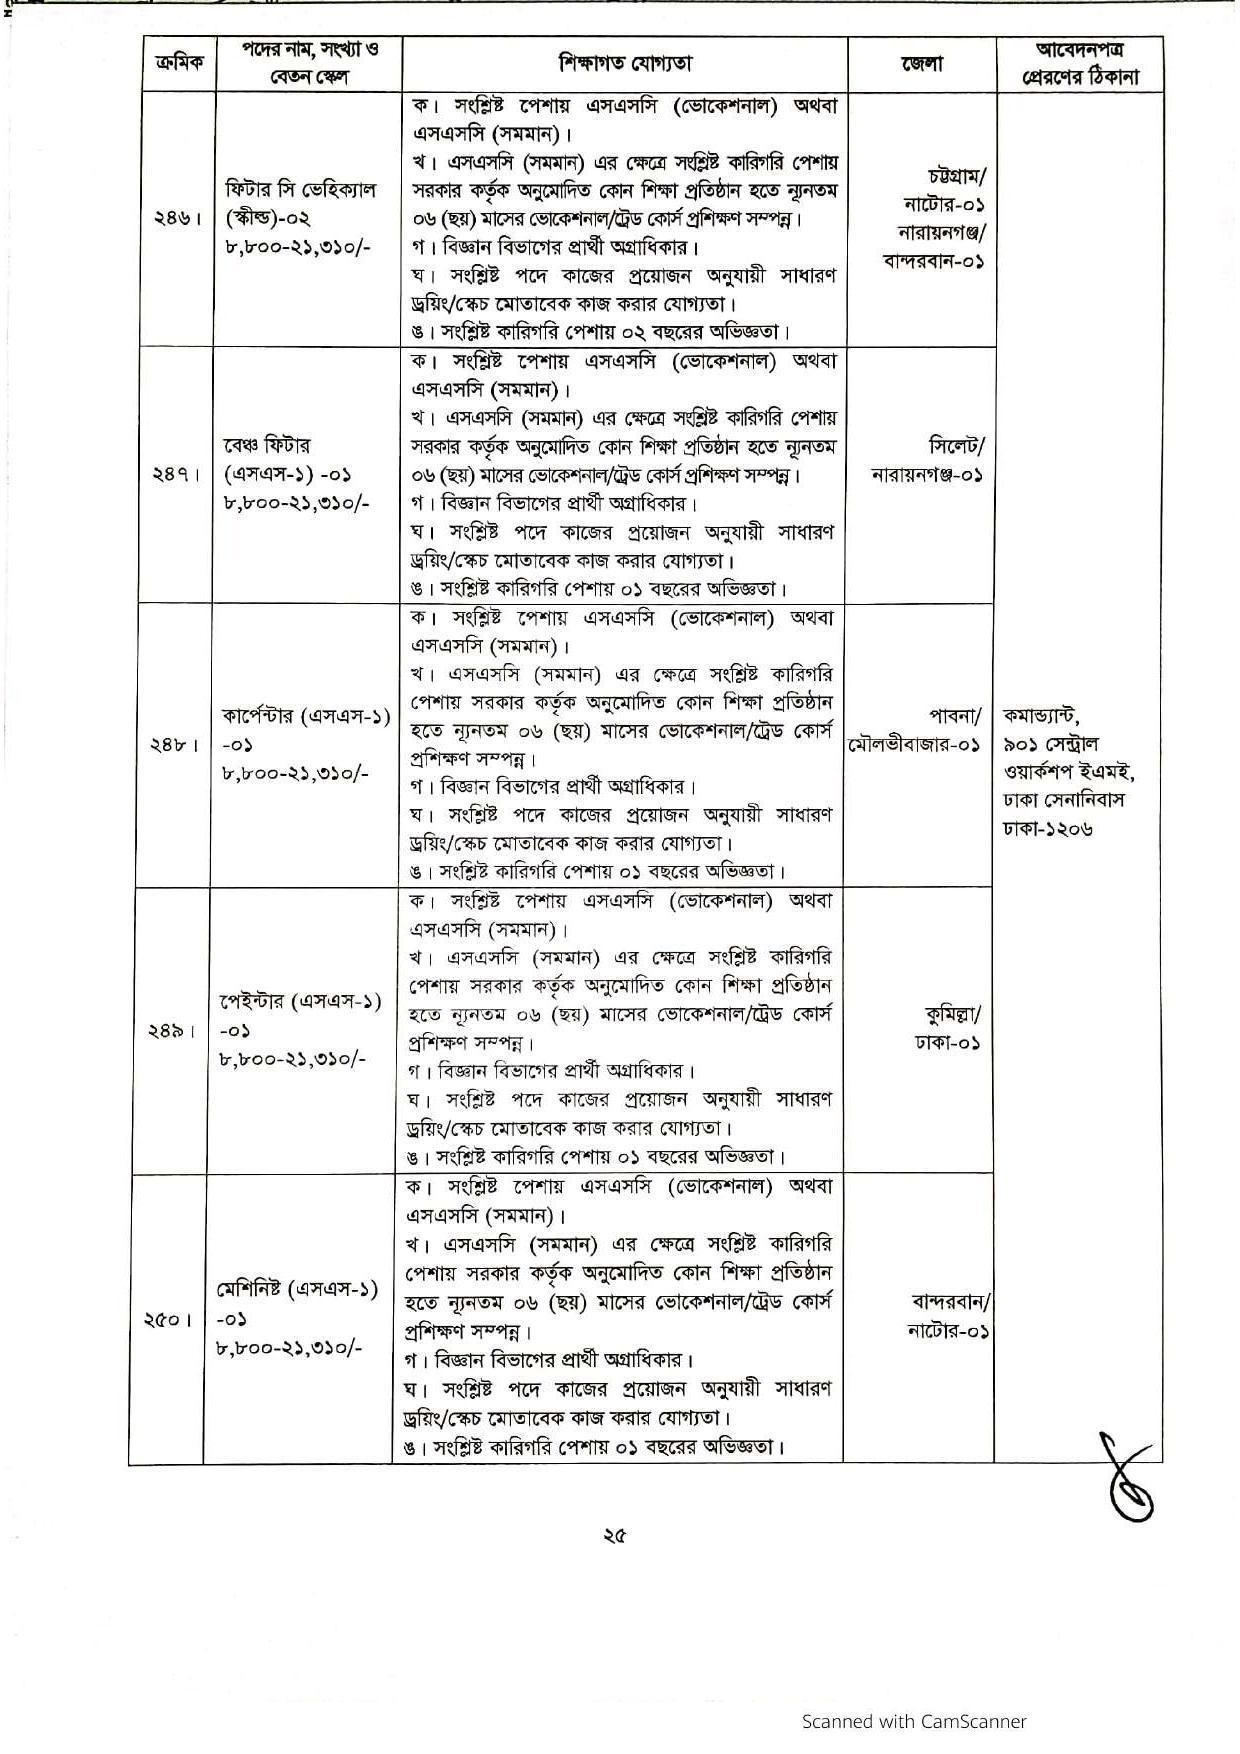 Bangladesh Army Job Circular 2021